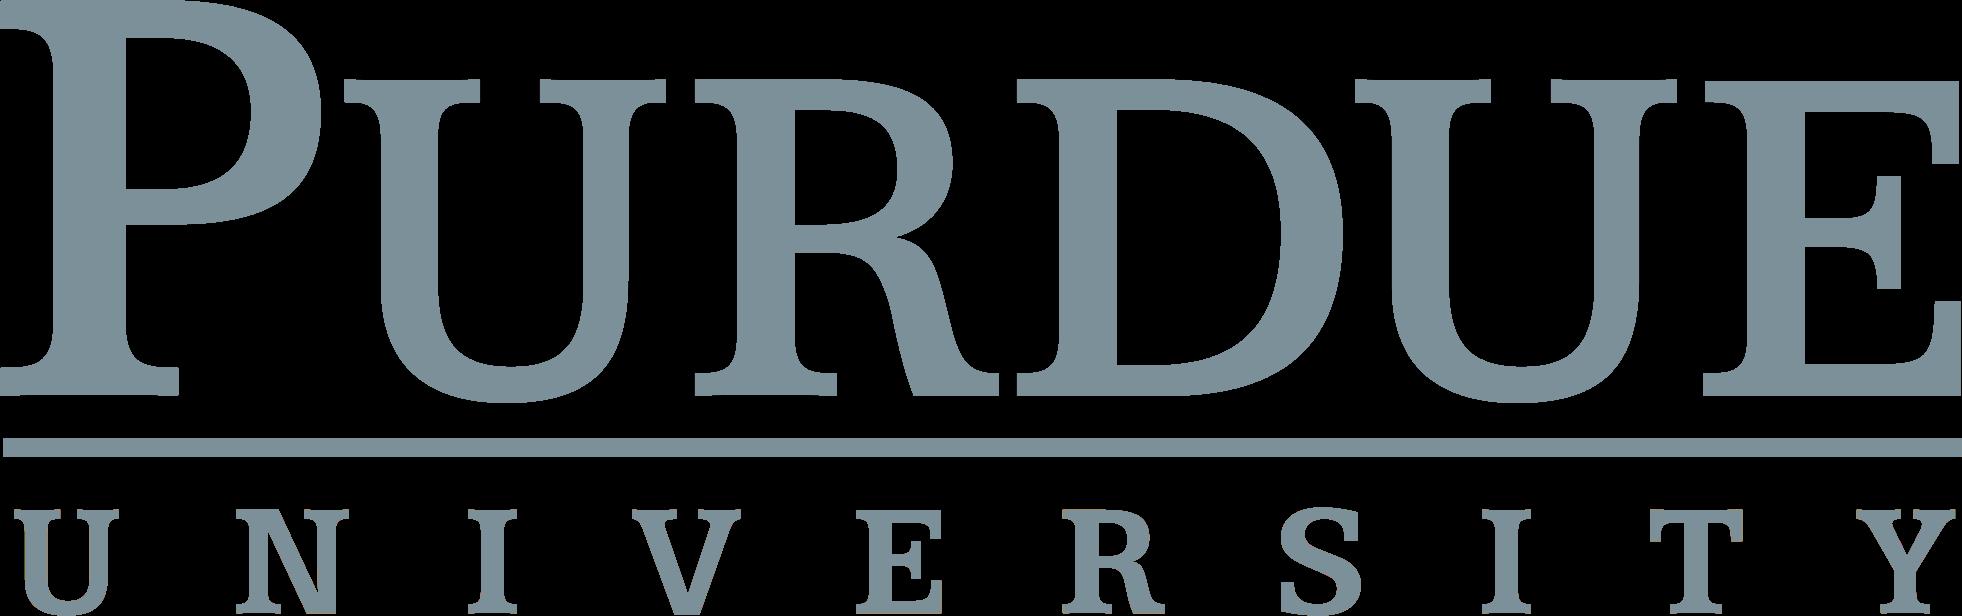 Purdue uses computer science platform